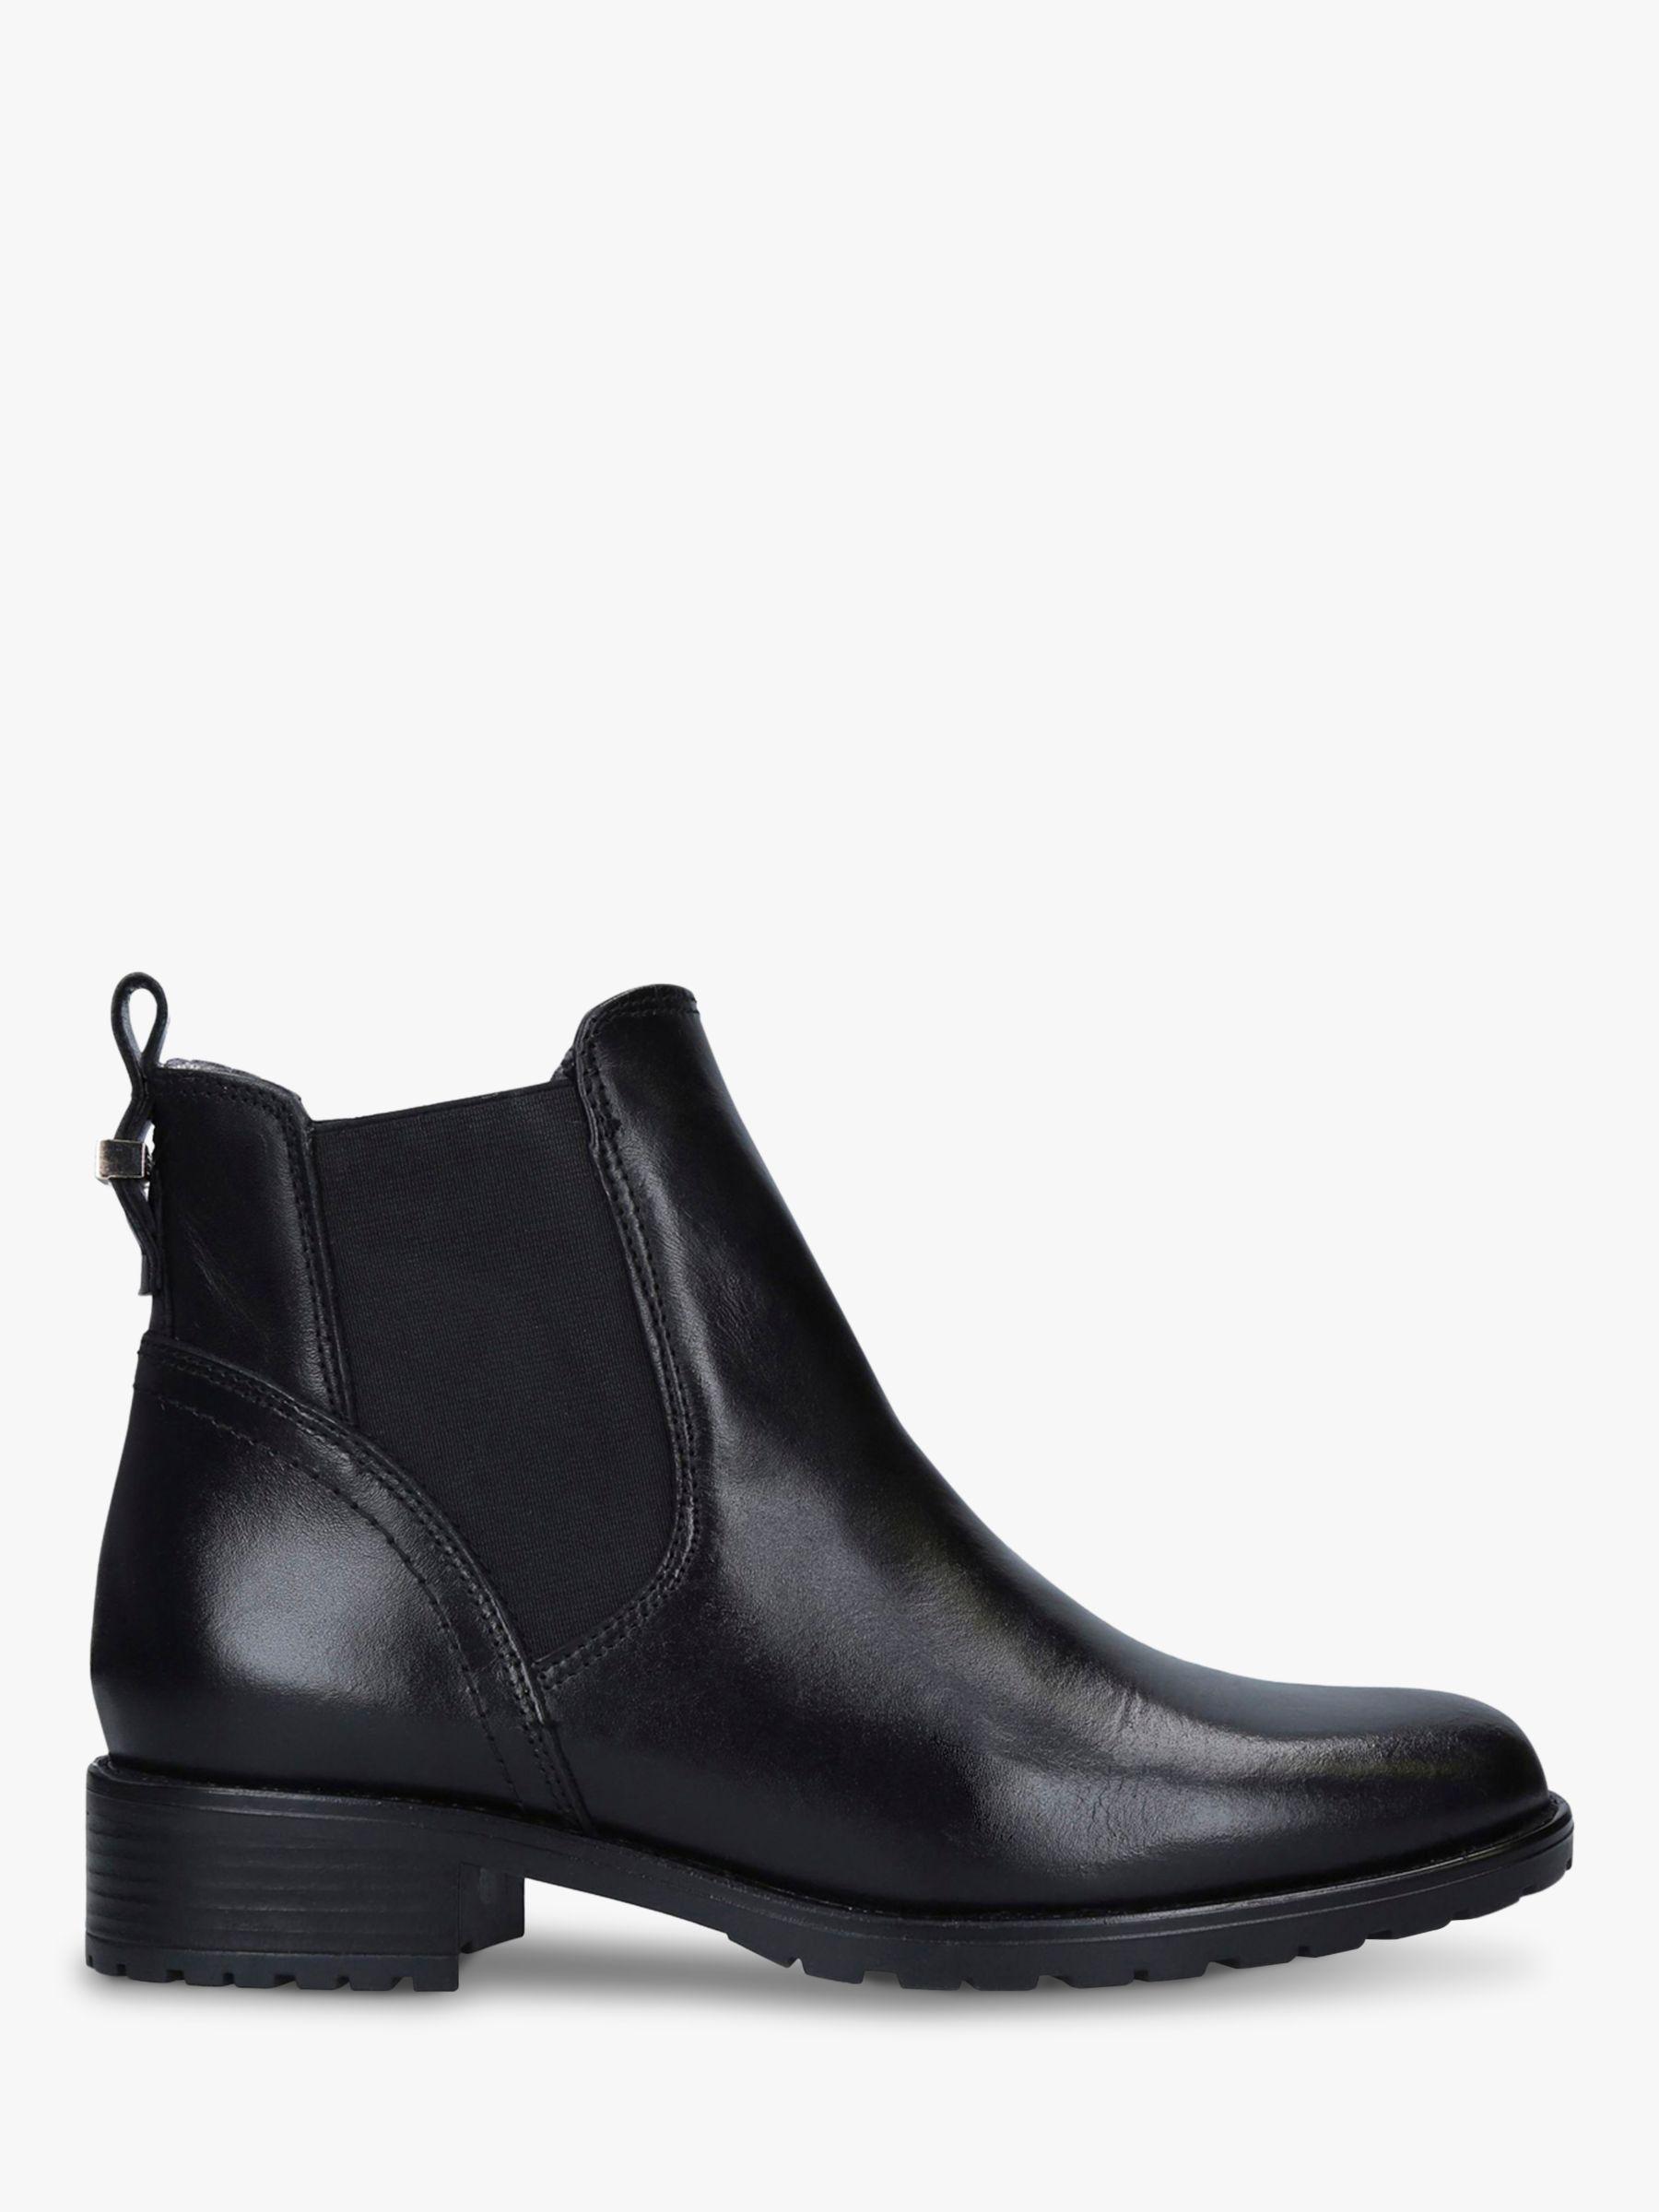 Carvela Comfort Carvela Comfort Russ Leather Chelsea Ankle Boots